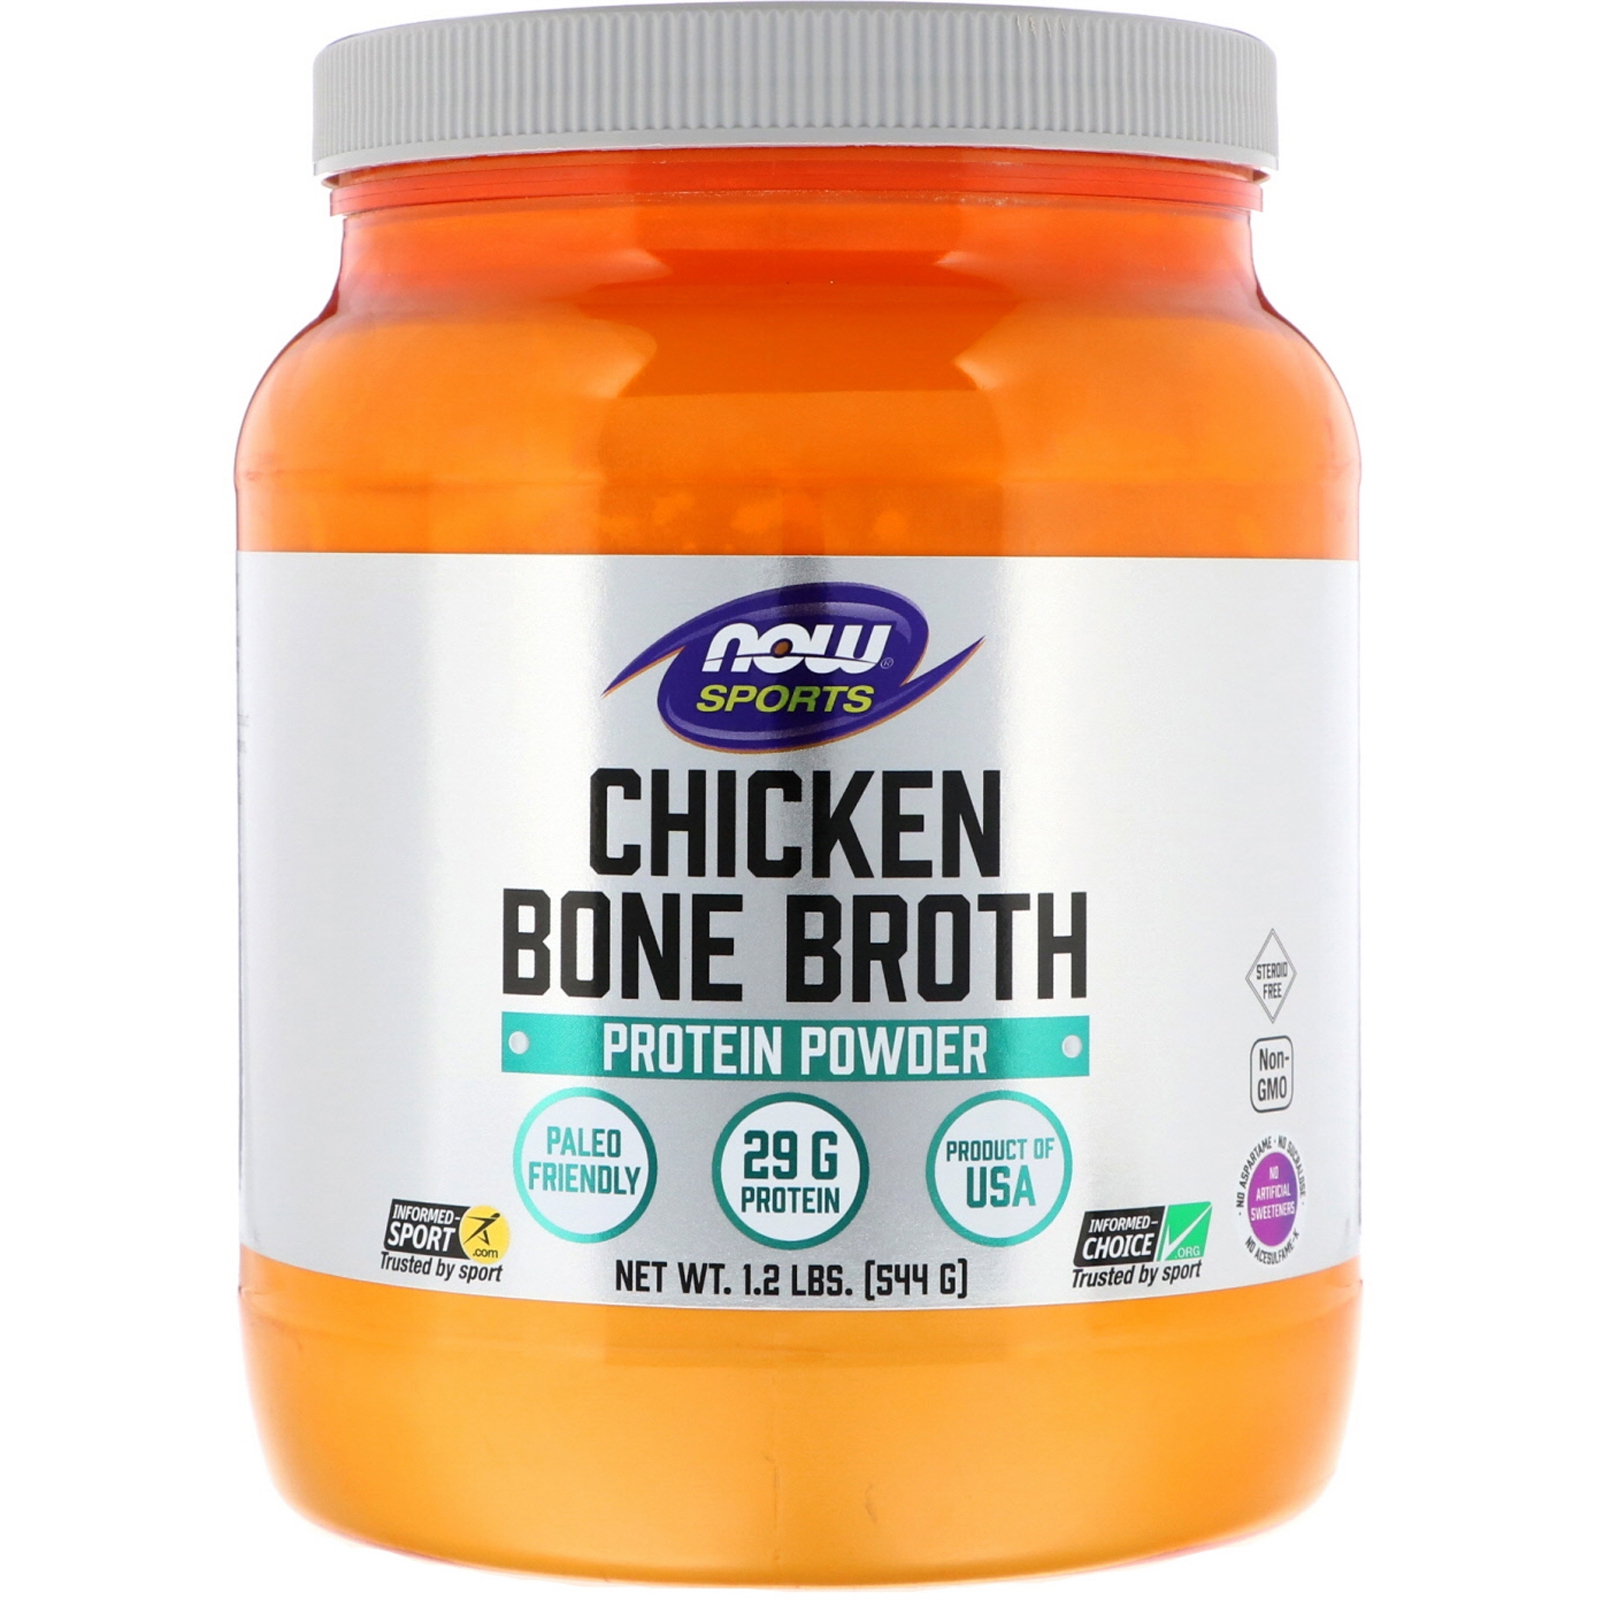 Image of Chicken Bone Broth (544 gram) - Now Foods 0733739019622